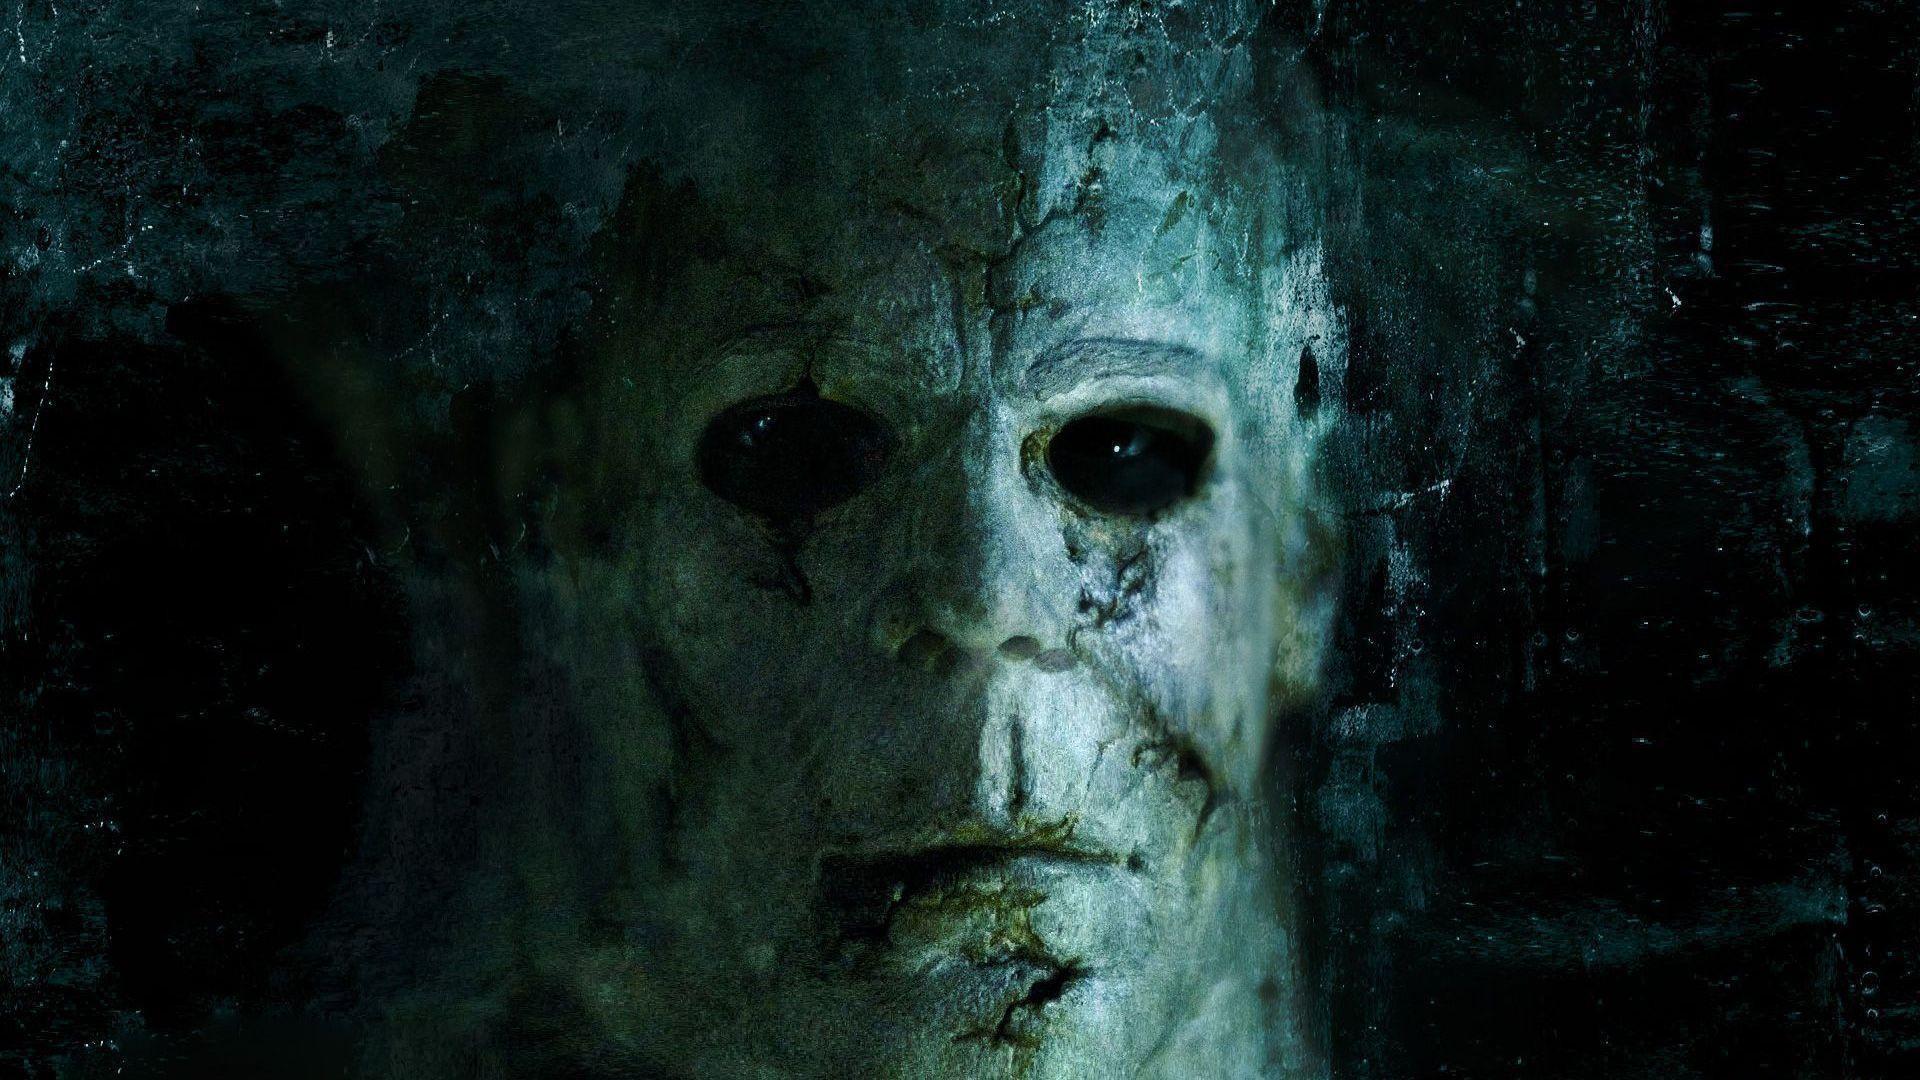 Michael Myers Halloween Wallpaper 3997 Download Free HD Desktop .